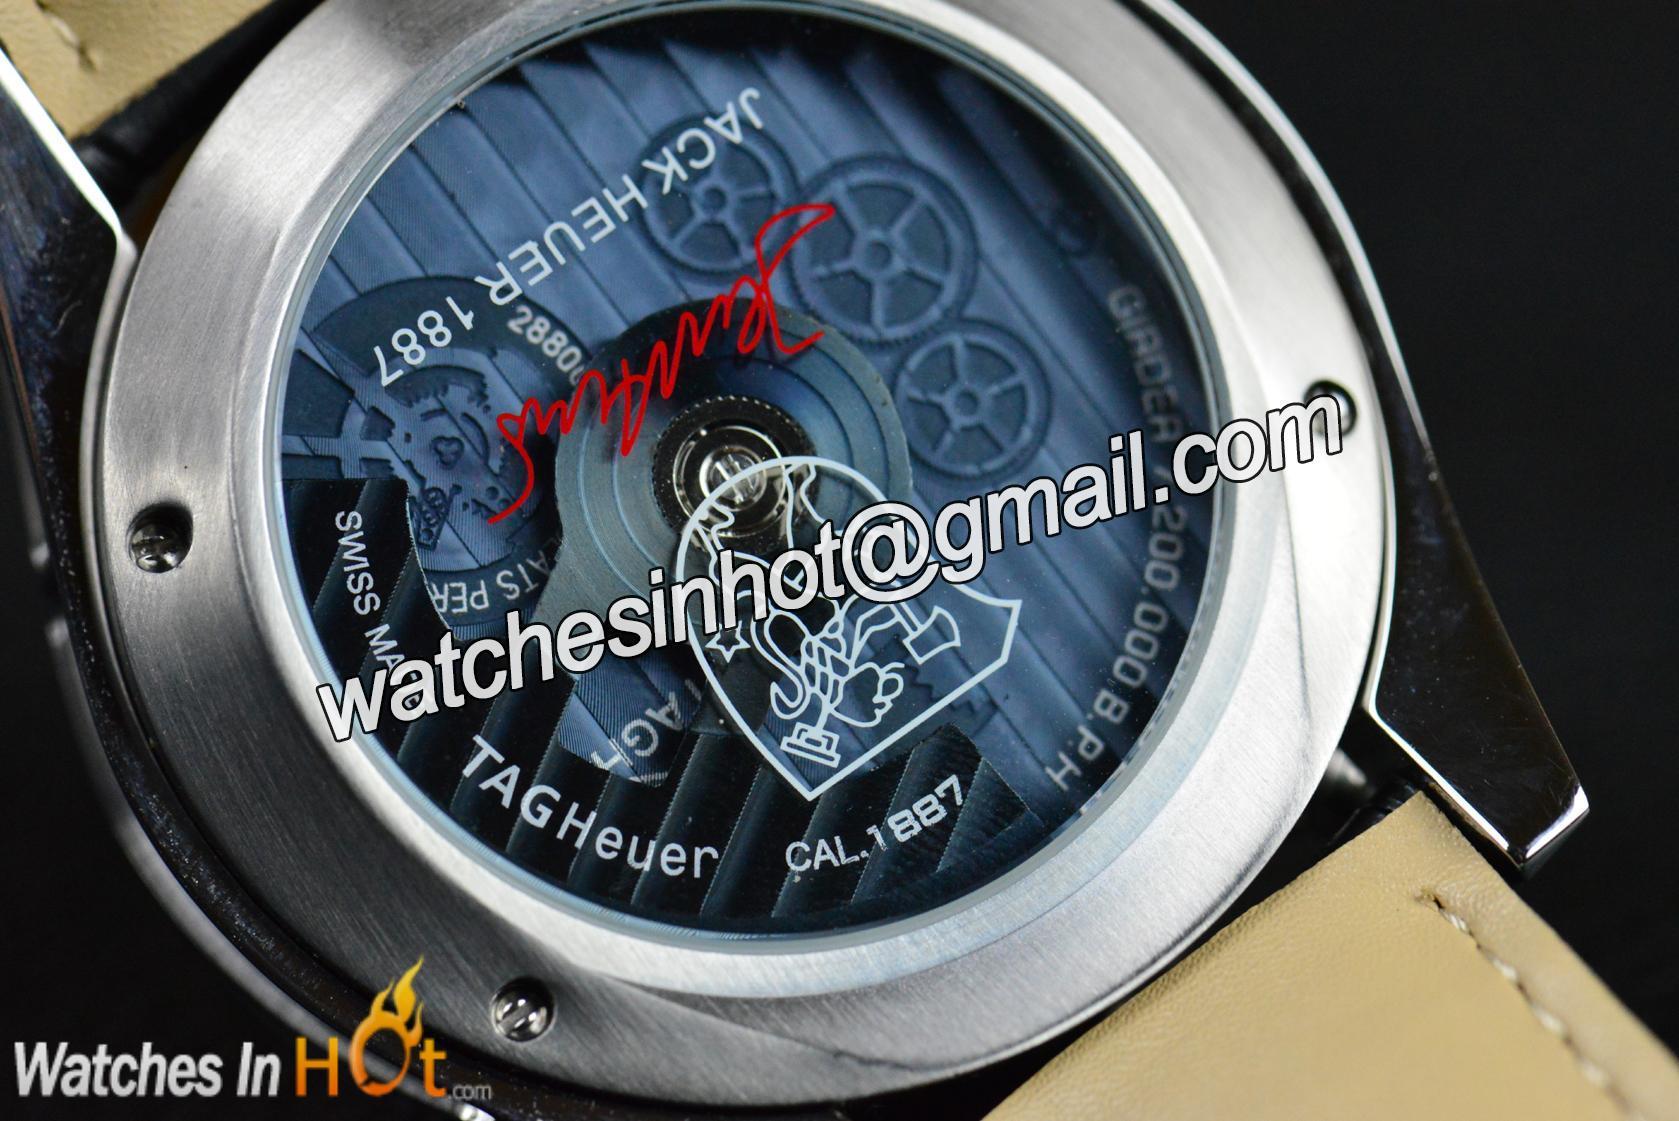 2417a0428d8 Seiko VK Quartz Movement on TAG Heuer Carrera Calibre 1887 Chronograph Jack  Heuer Edition Replica Watch